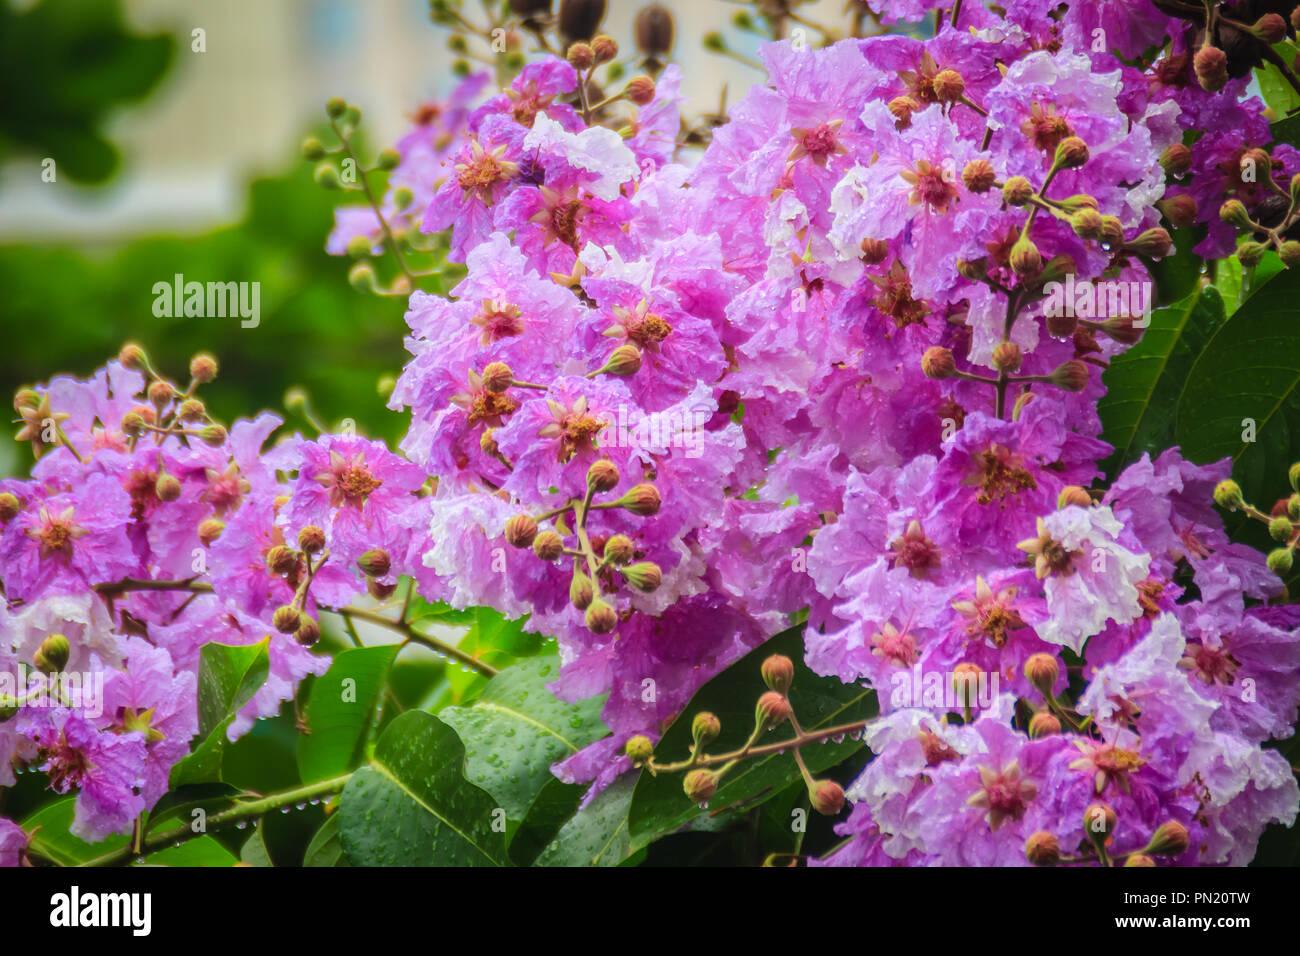 Beautiful Purple Flower Of Lagerstroemia Speciosa Giant Crape